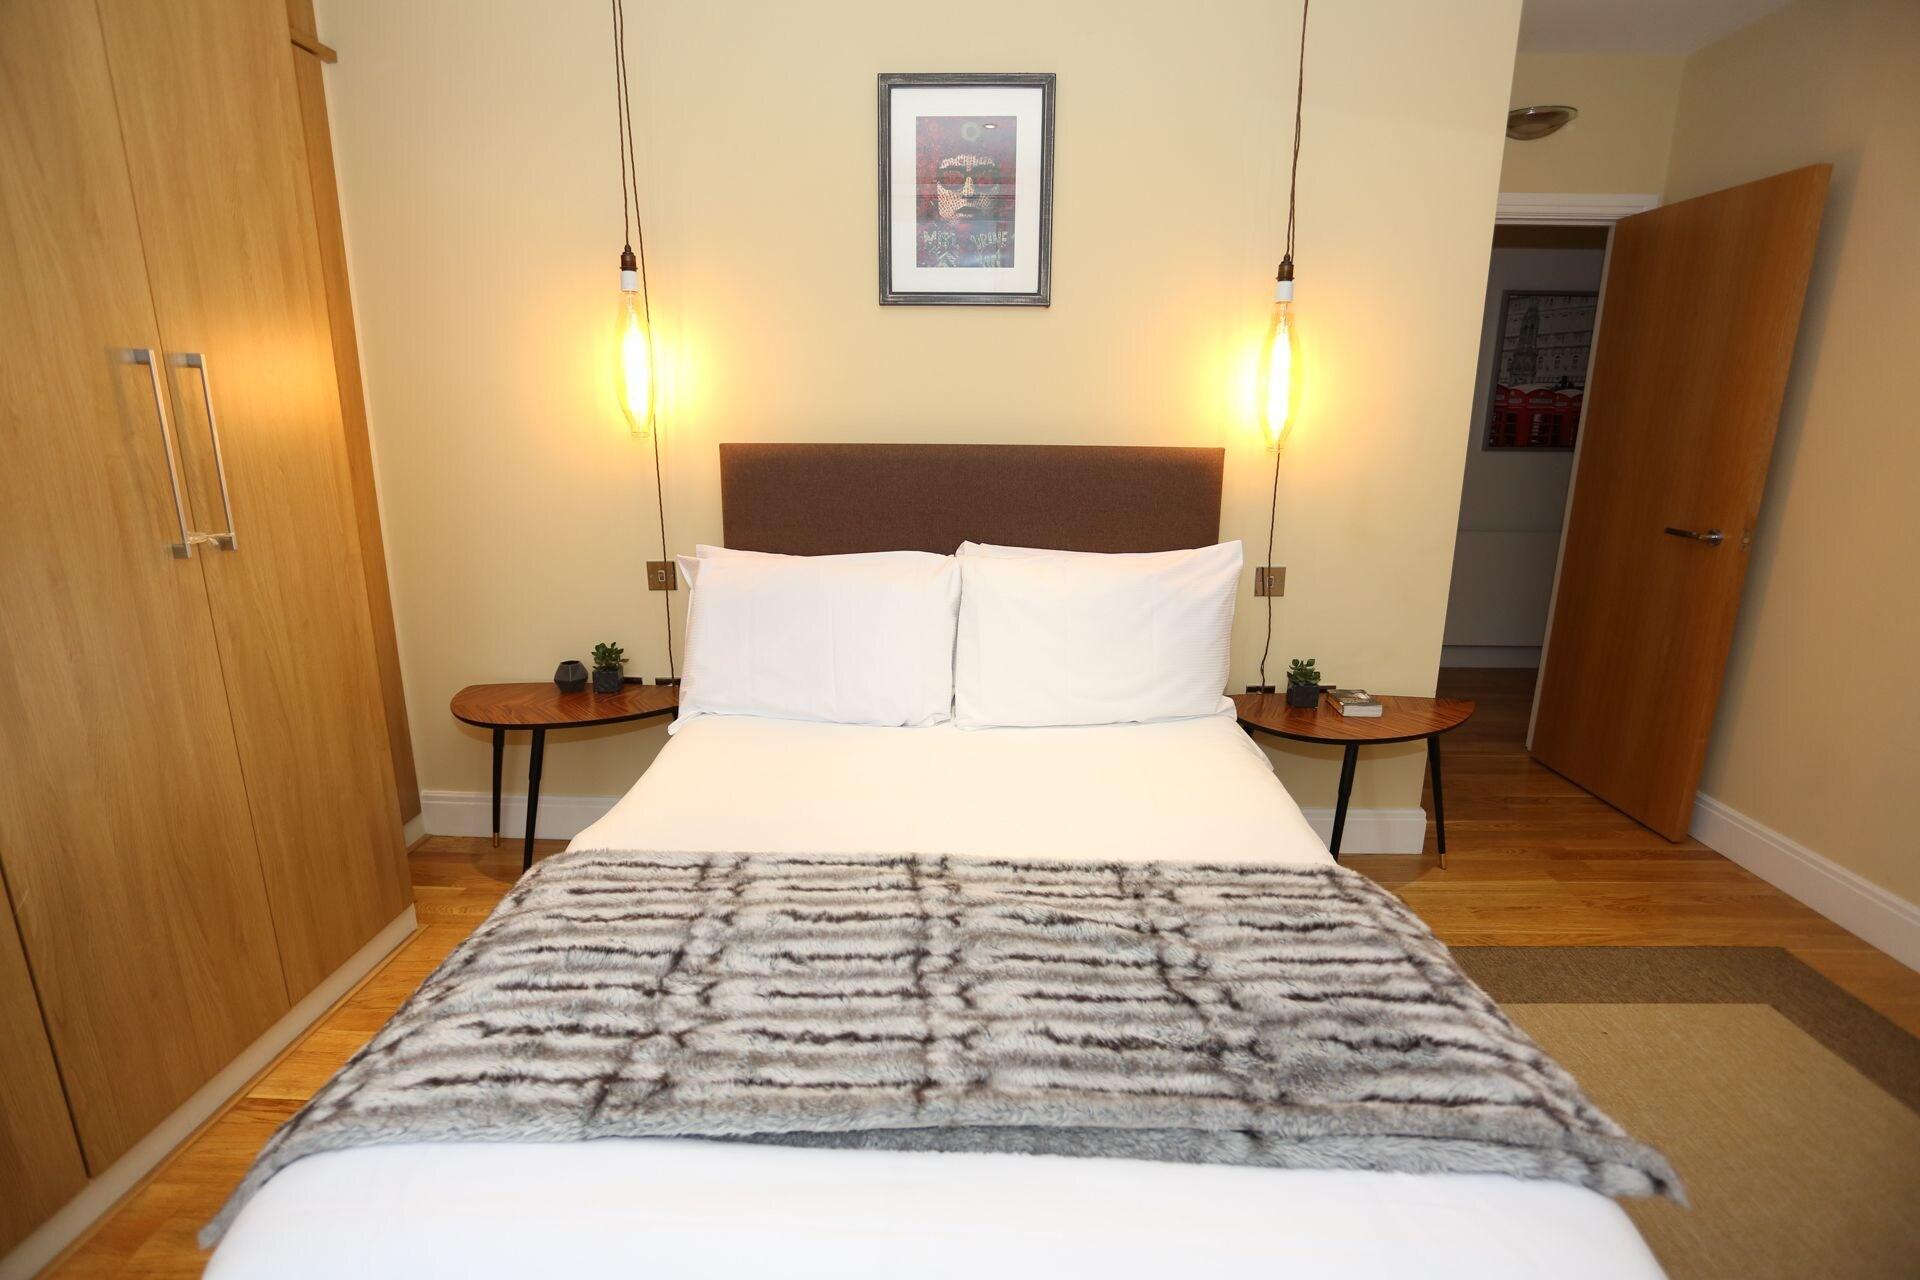 3 Beds/2 Baths Penthouse, London